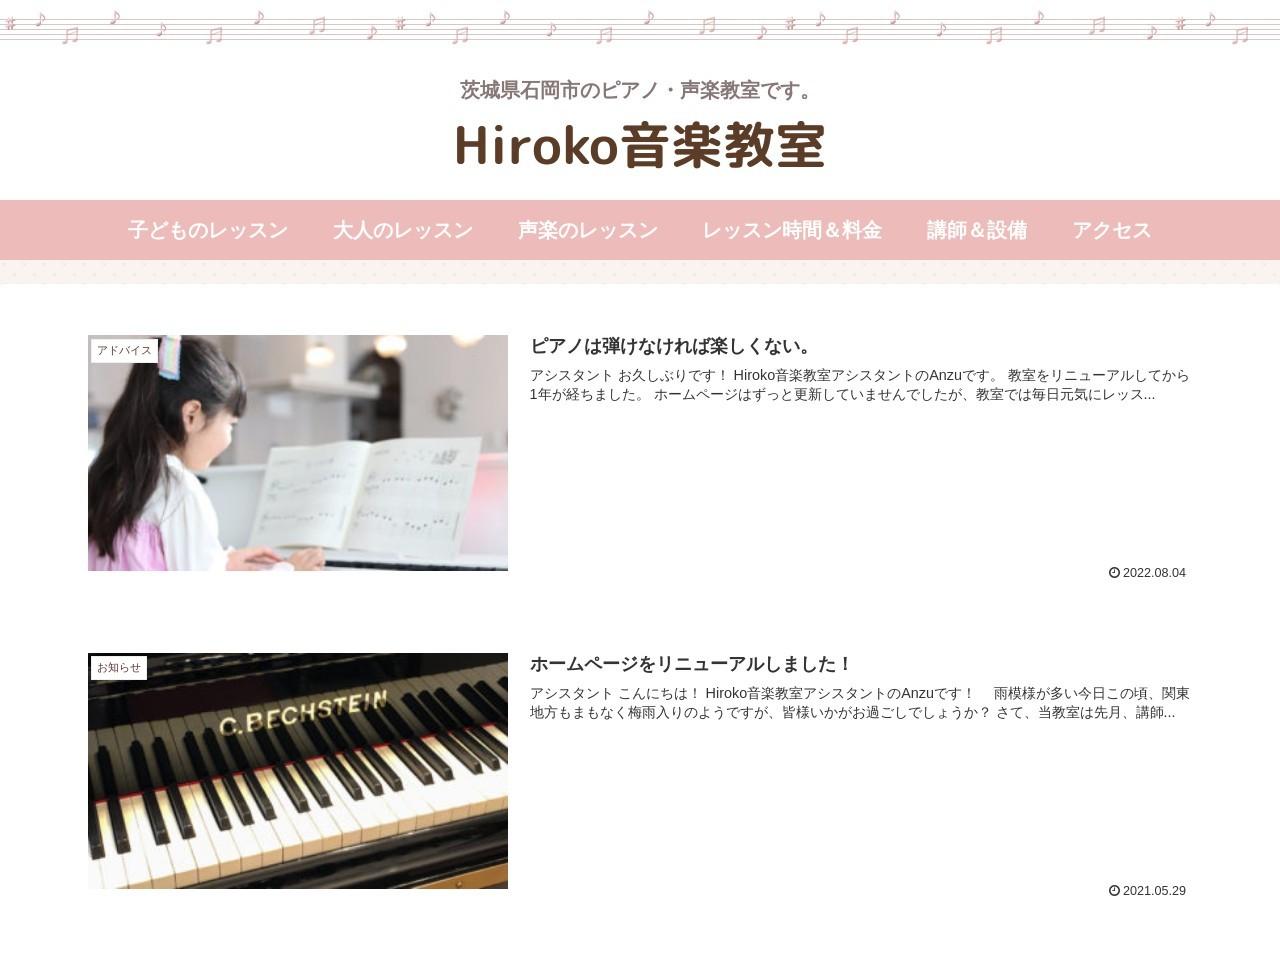 Hiroko音楽教室のサムネイル